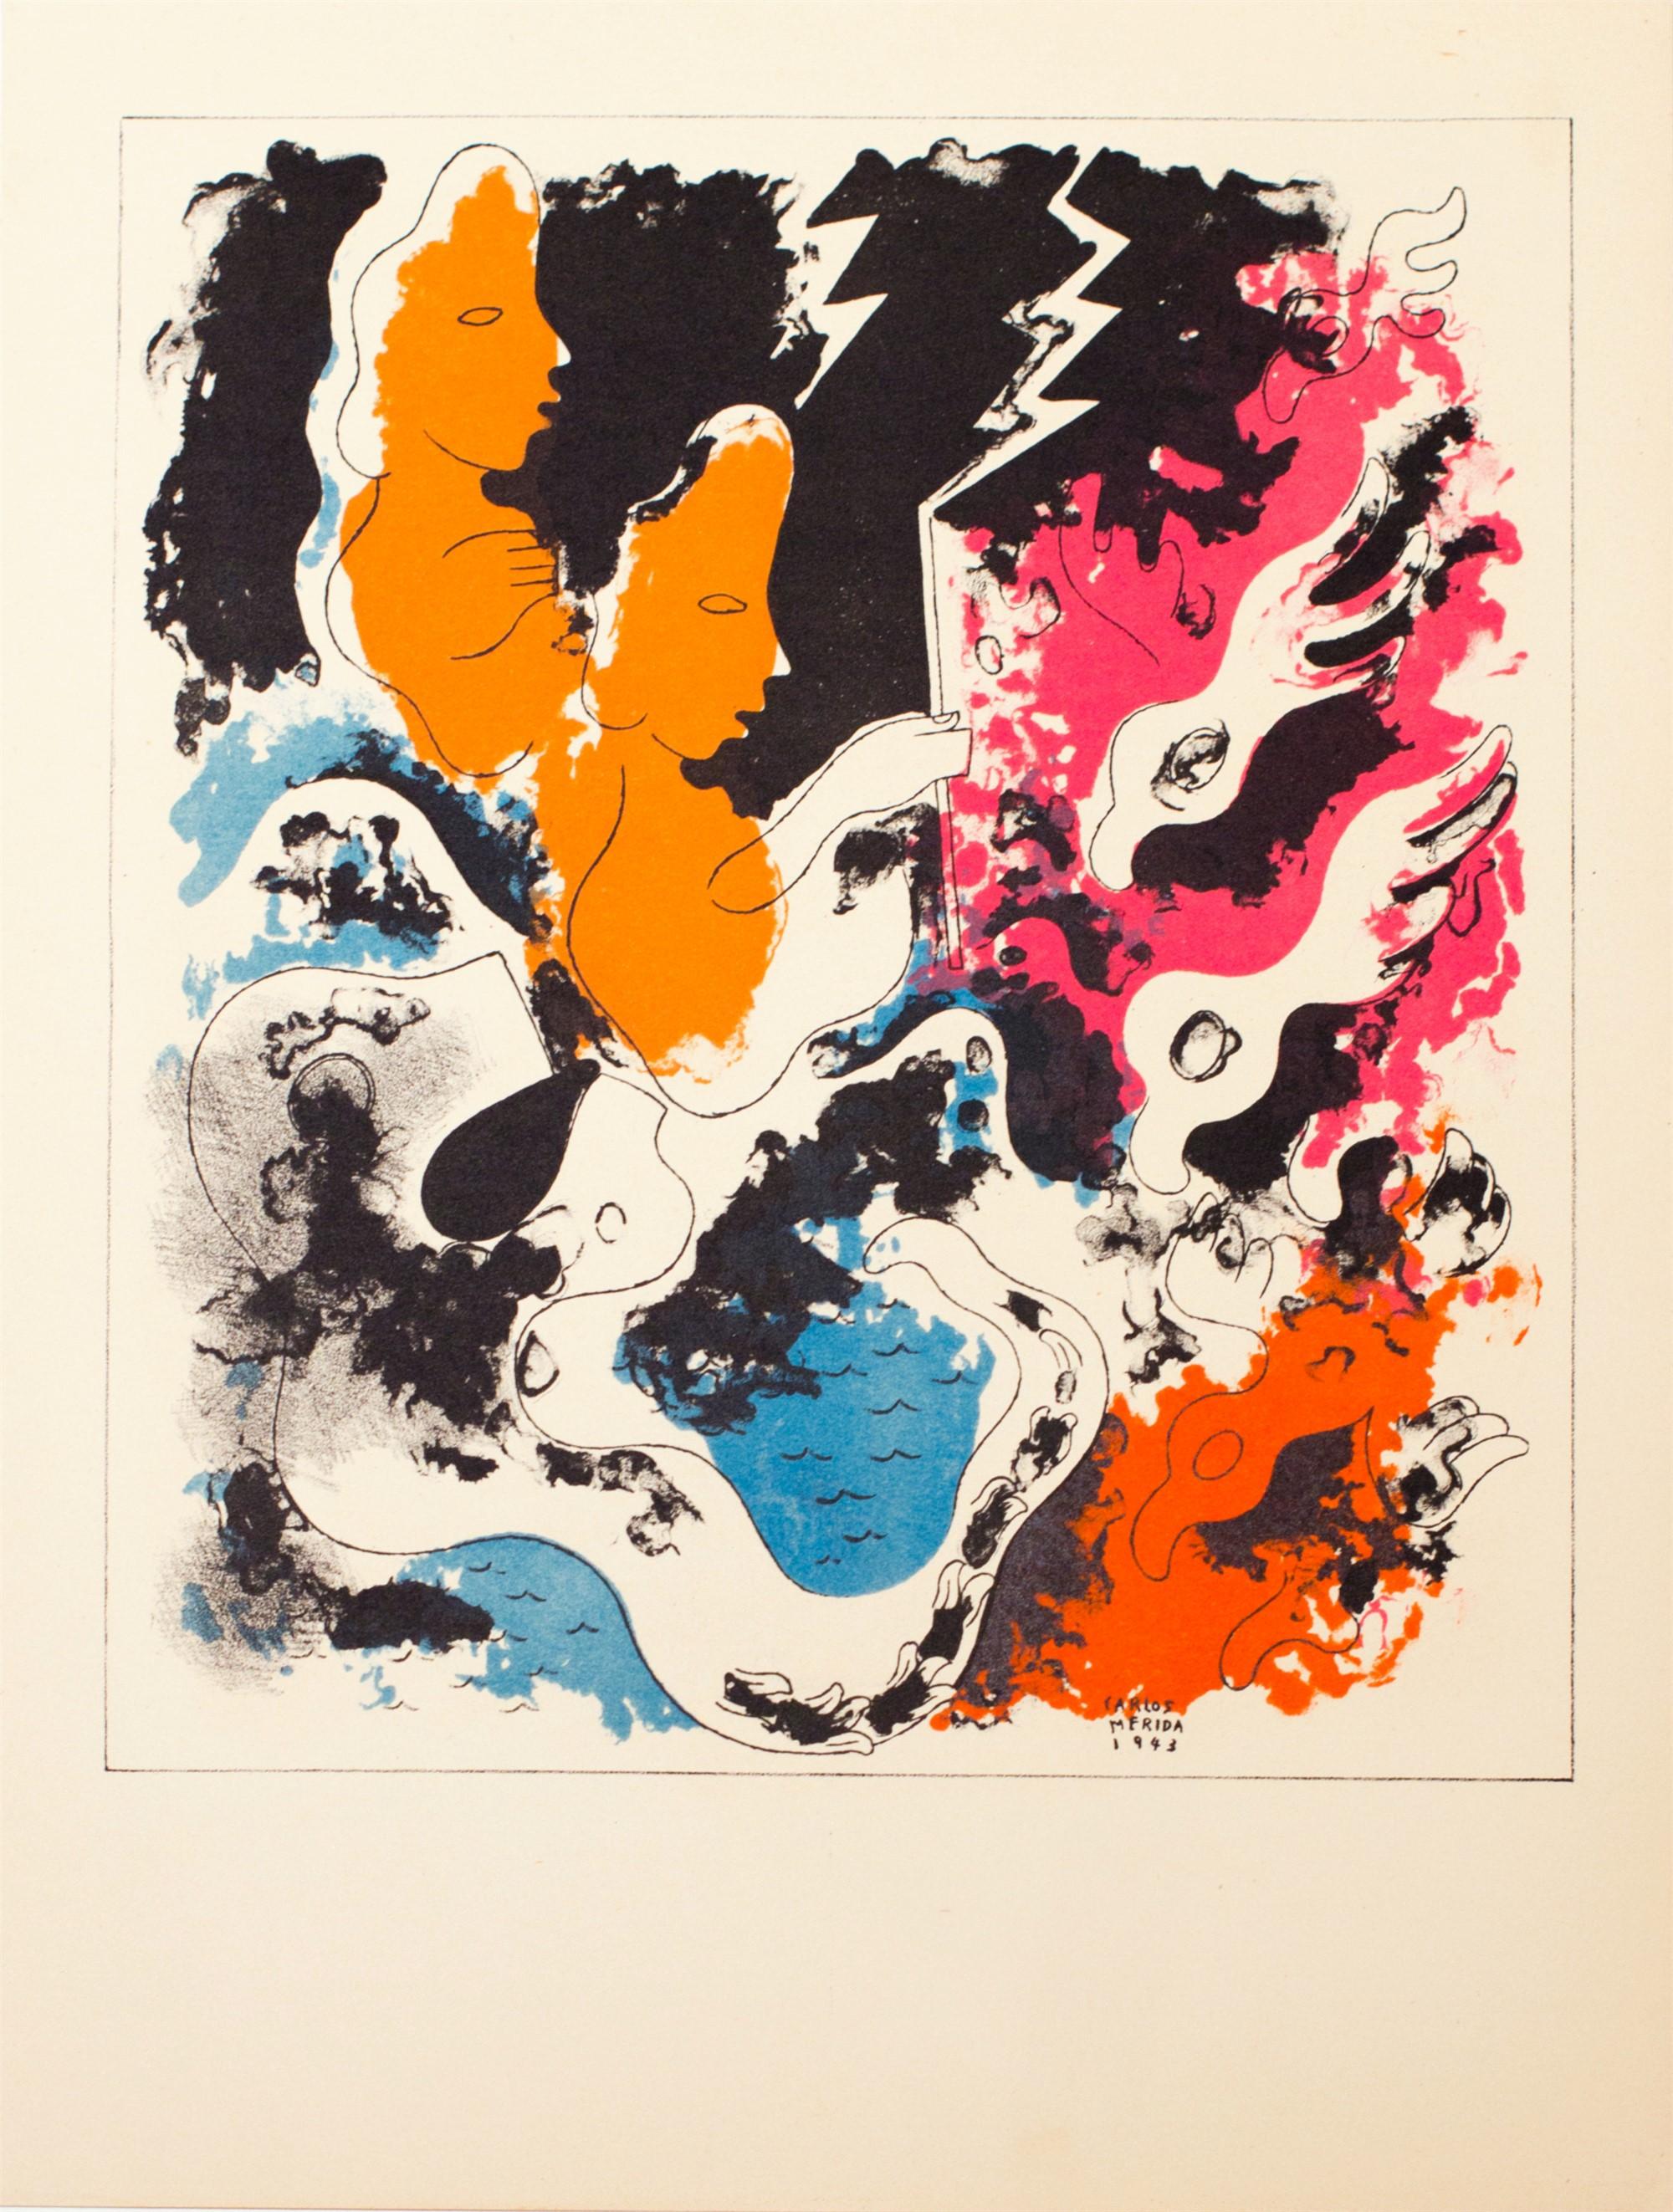 Estampas de Popol Vuh (Plate IX) by Carlos Mérida (1891 - 1985)